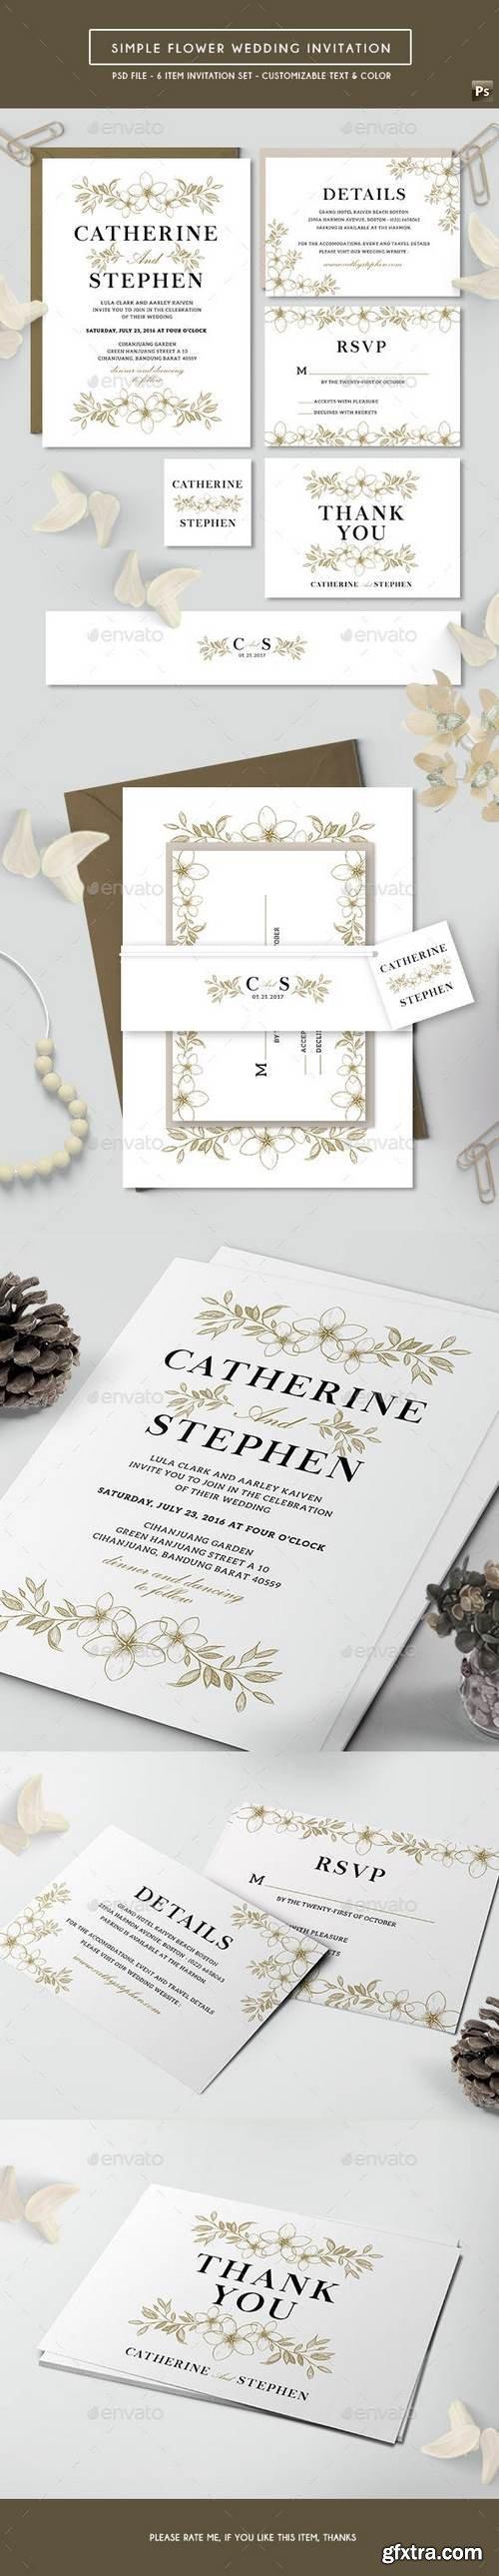 Graphicriver - Simple Flower Wedding Invitation 17743313